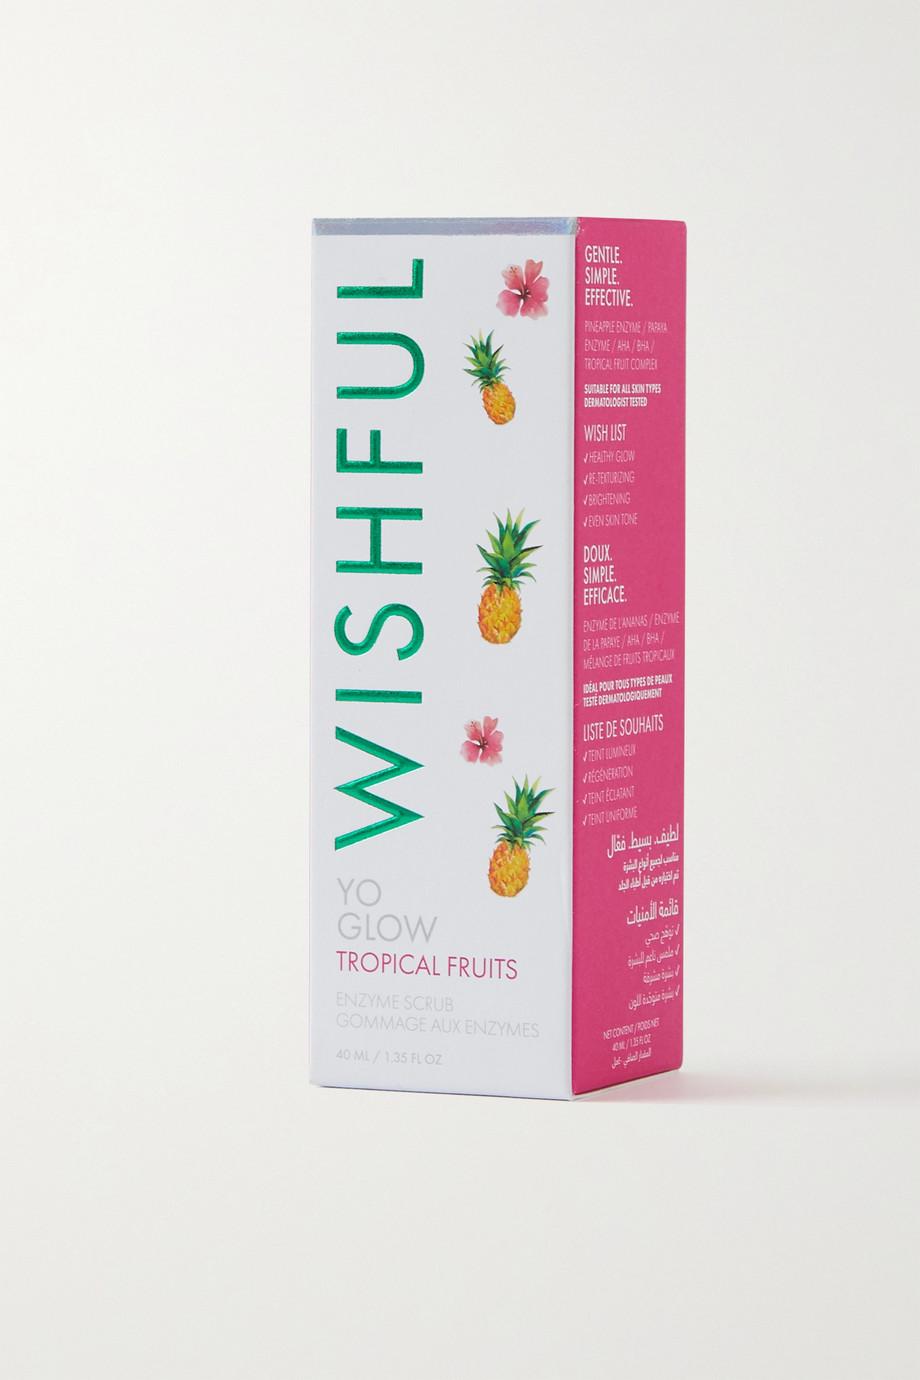 Huda Beauty Wishful Yo Glow Tropical Fruits Enzyme Scrub, 40 ml – Peeling